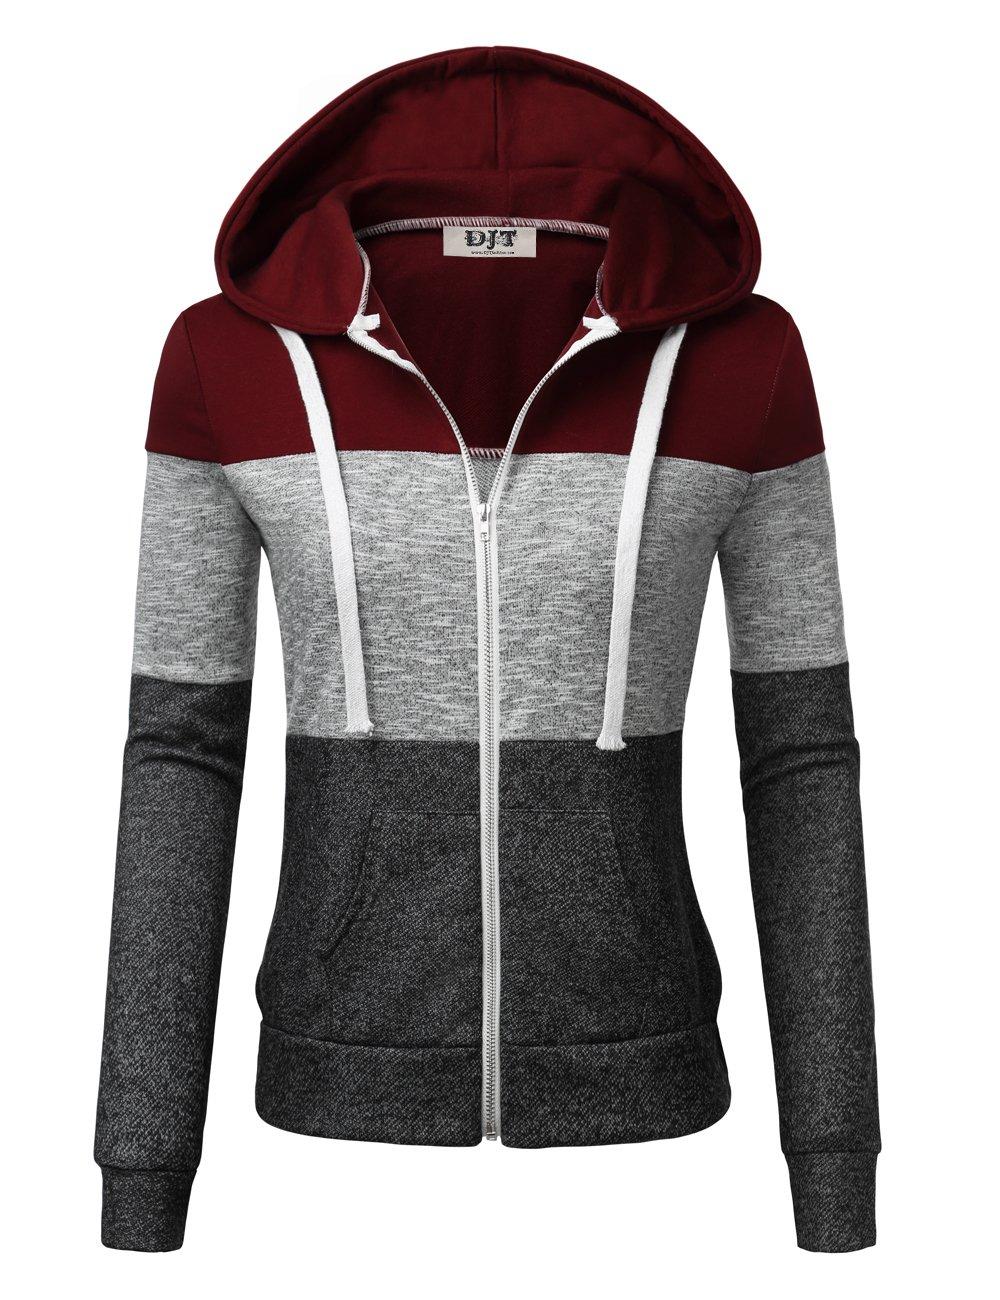 DJT Hoodie Jacket for Women, Women's Color Block Long Sleeve Zip-up Sweatshirt Hoodie with Pockets Wine M